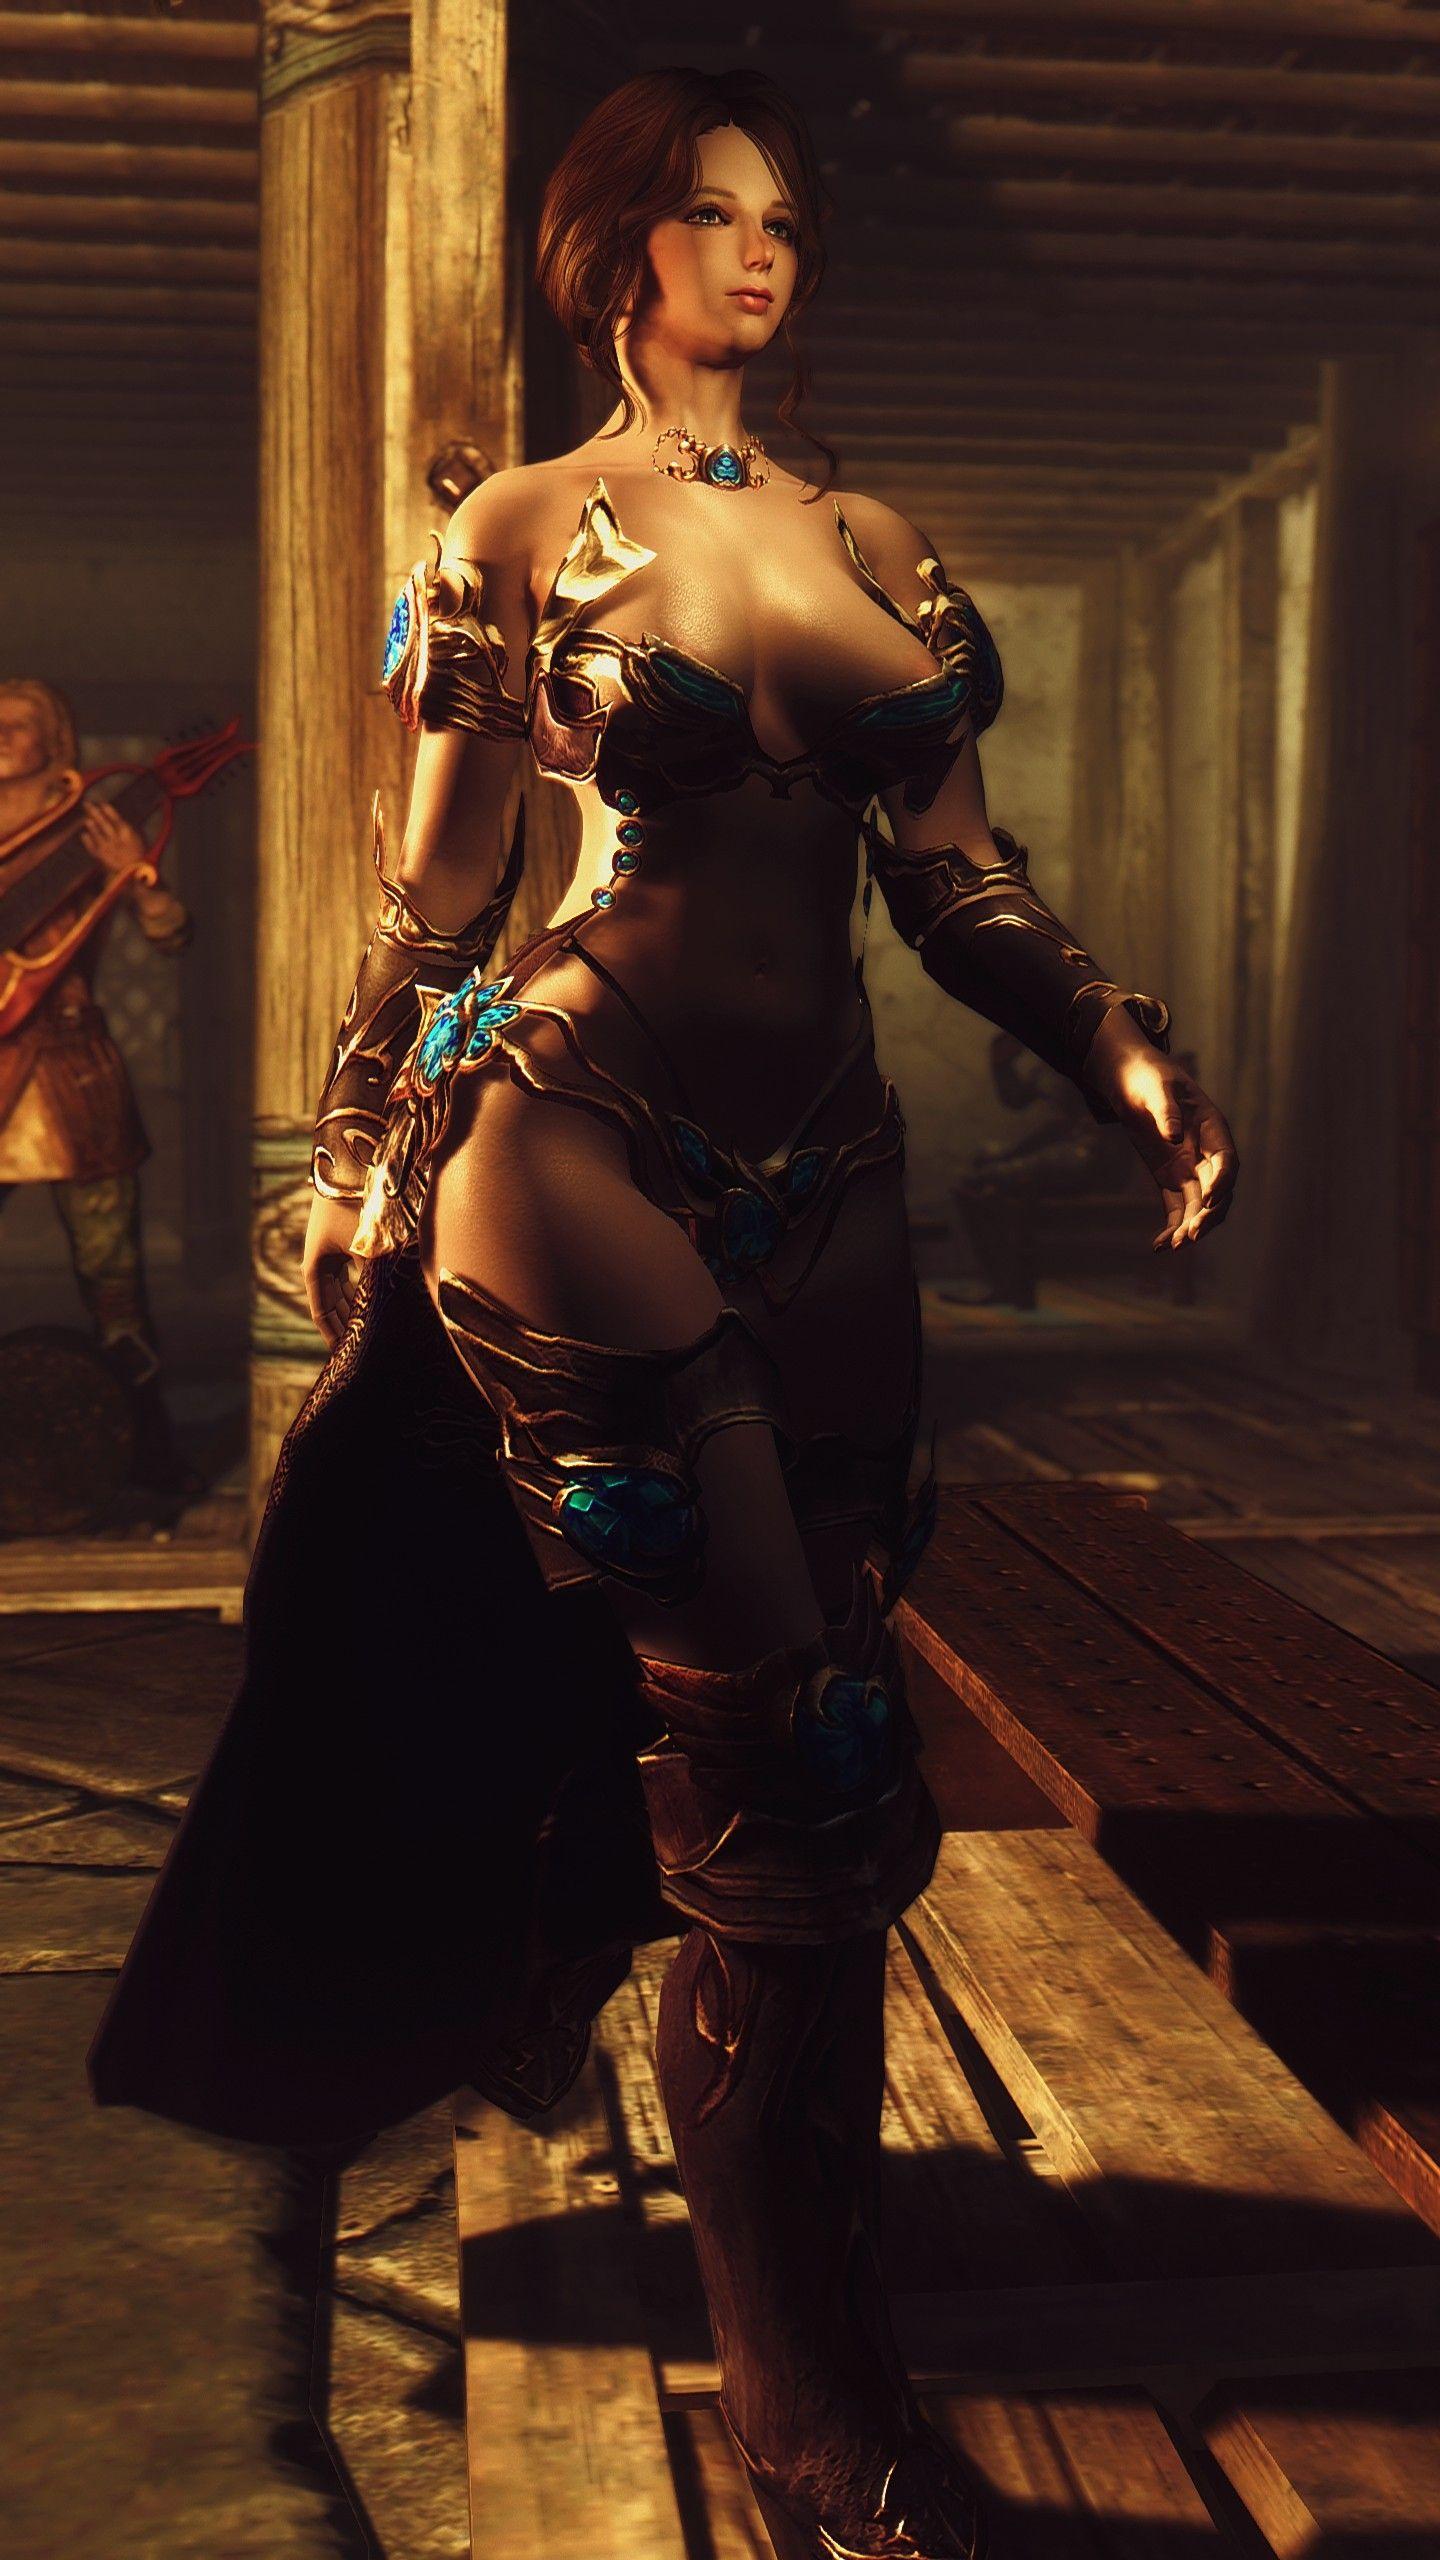 Summary -> Sexy Vanilla Female Armor For Unp And Sevenbase With Bbp